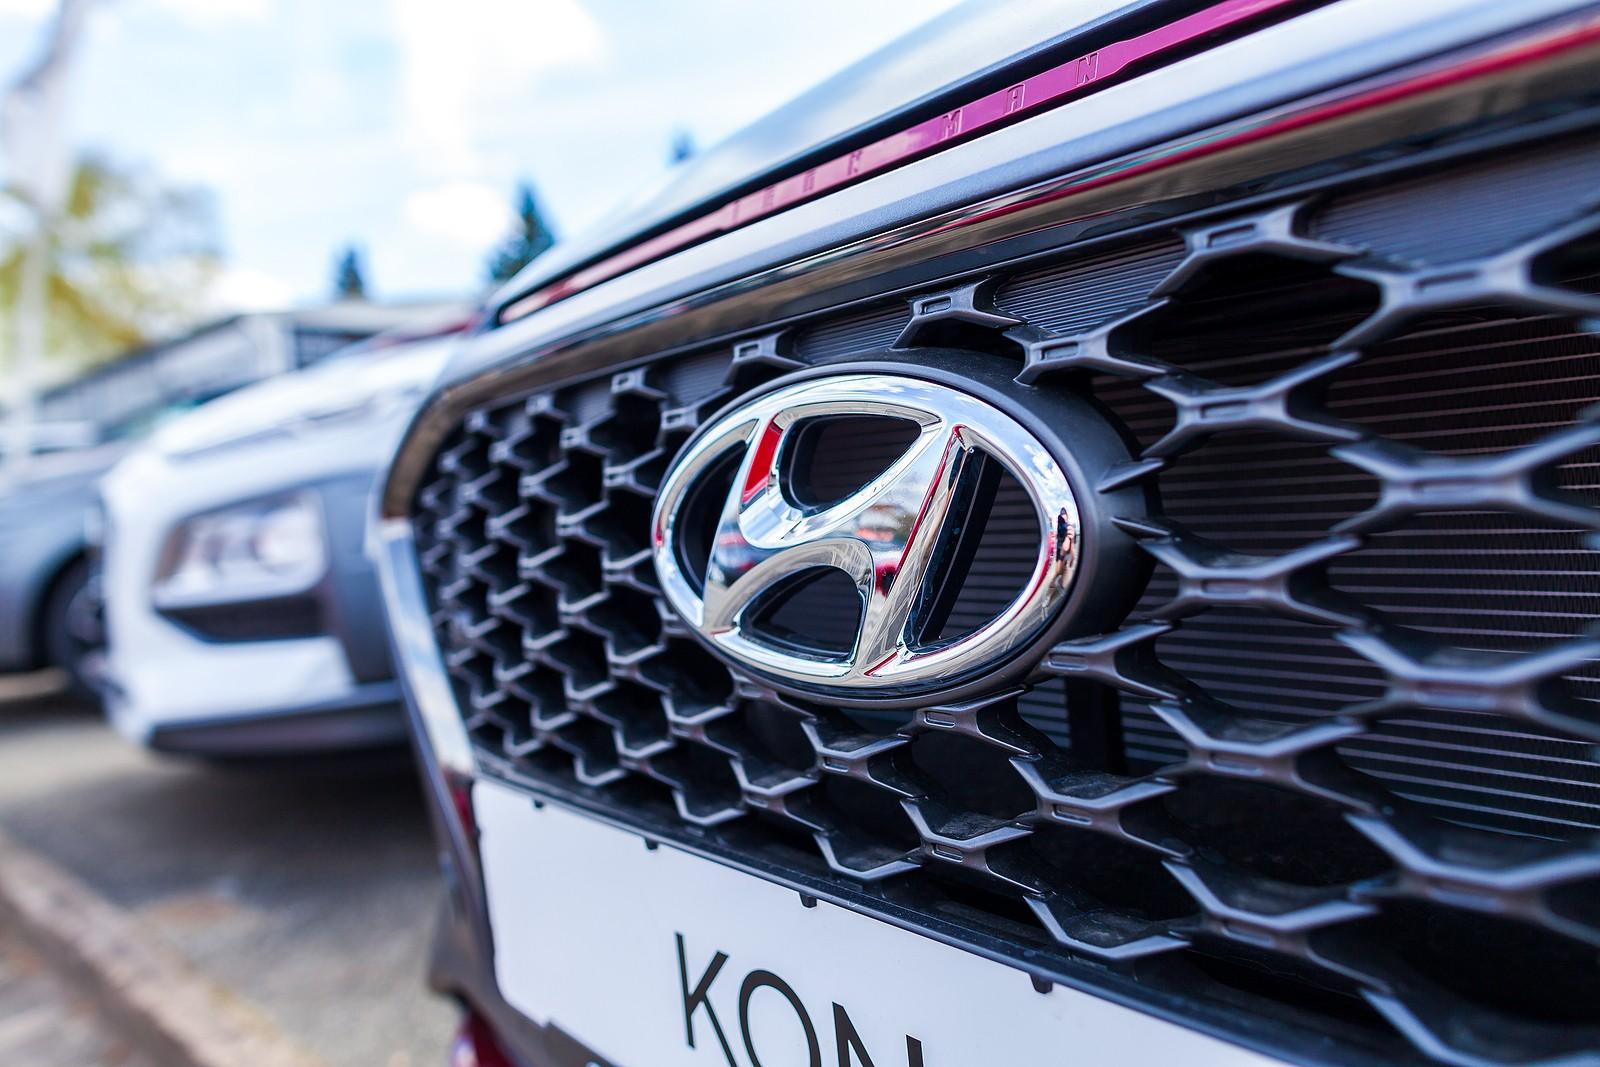 Hyundai Kona Problems – The 2019 Model is a WINNER!